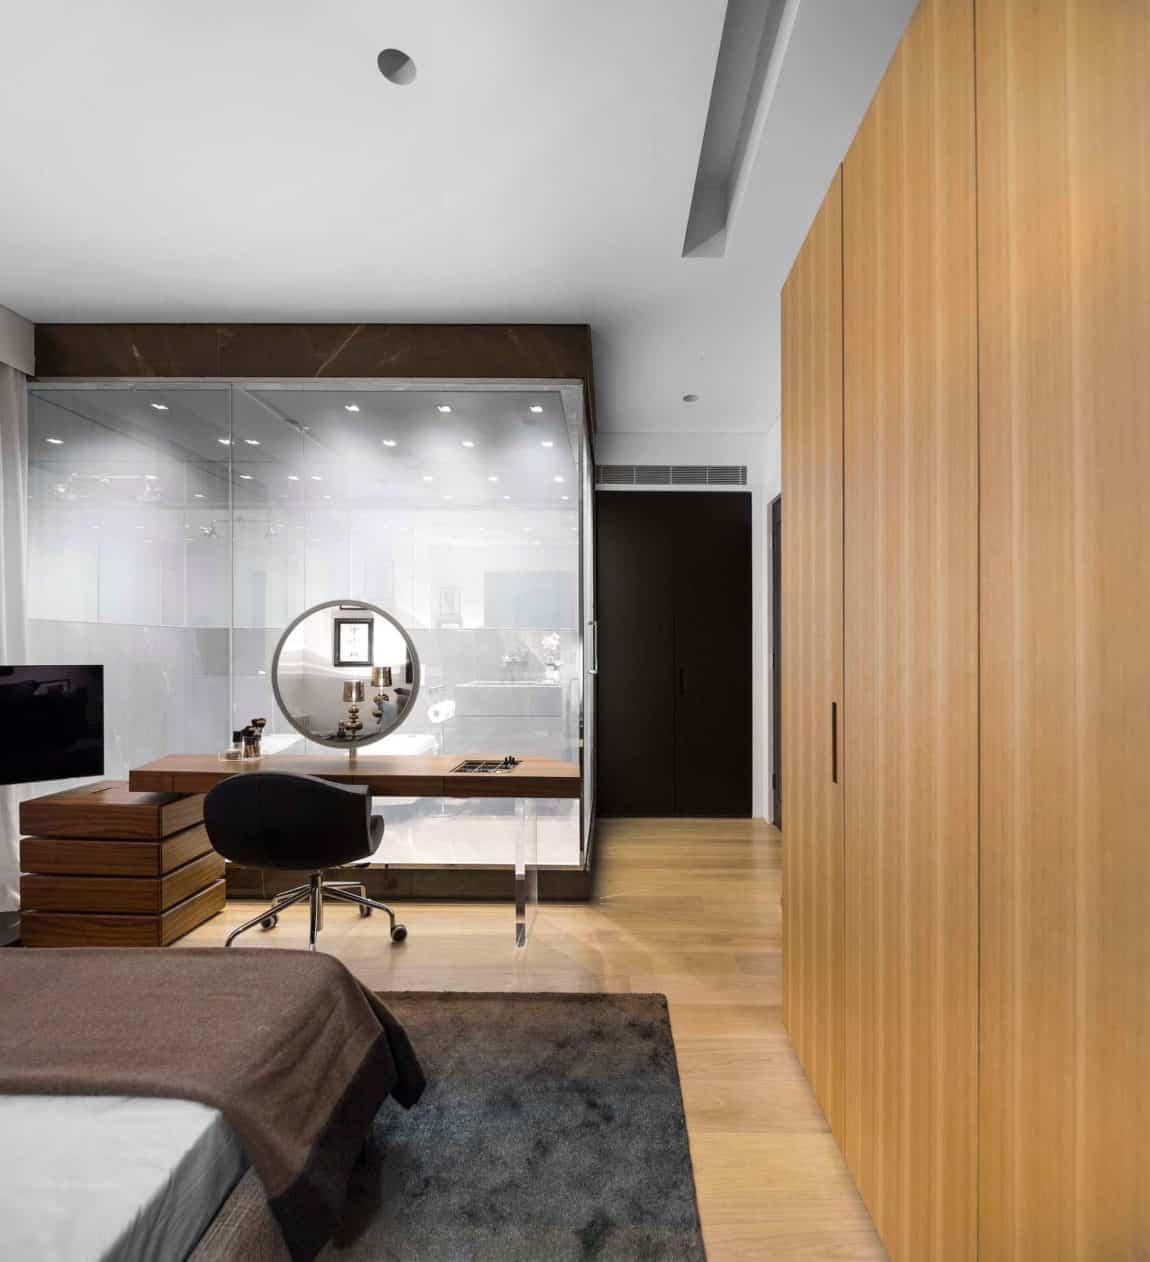 London Penthouse by Fernanda Marques Arquitetos Assoc (11)